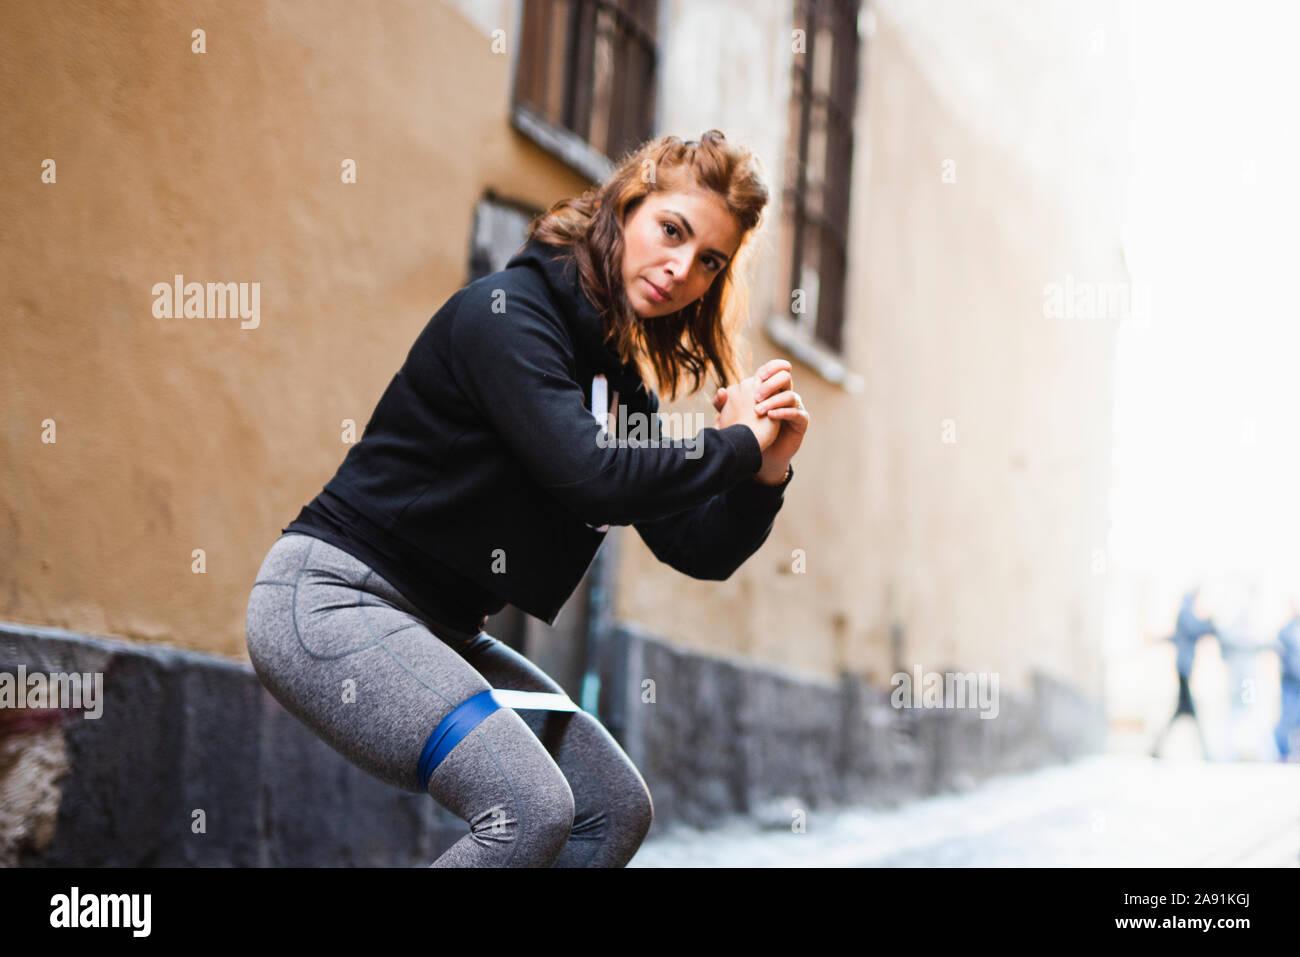 Mujer realizando sentadilla Foto de stock